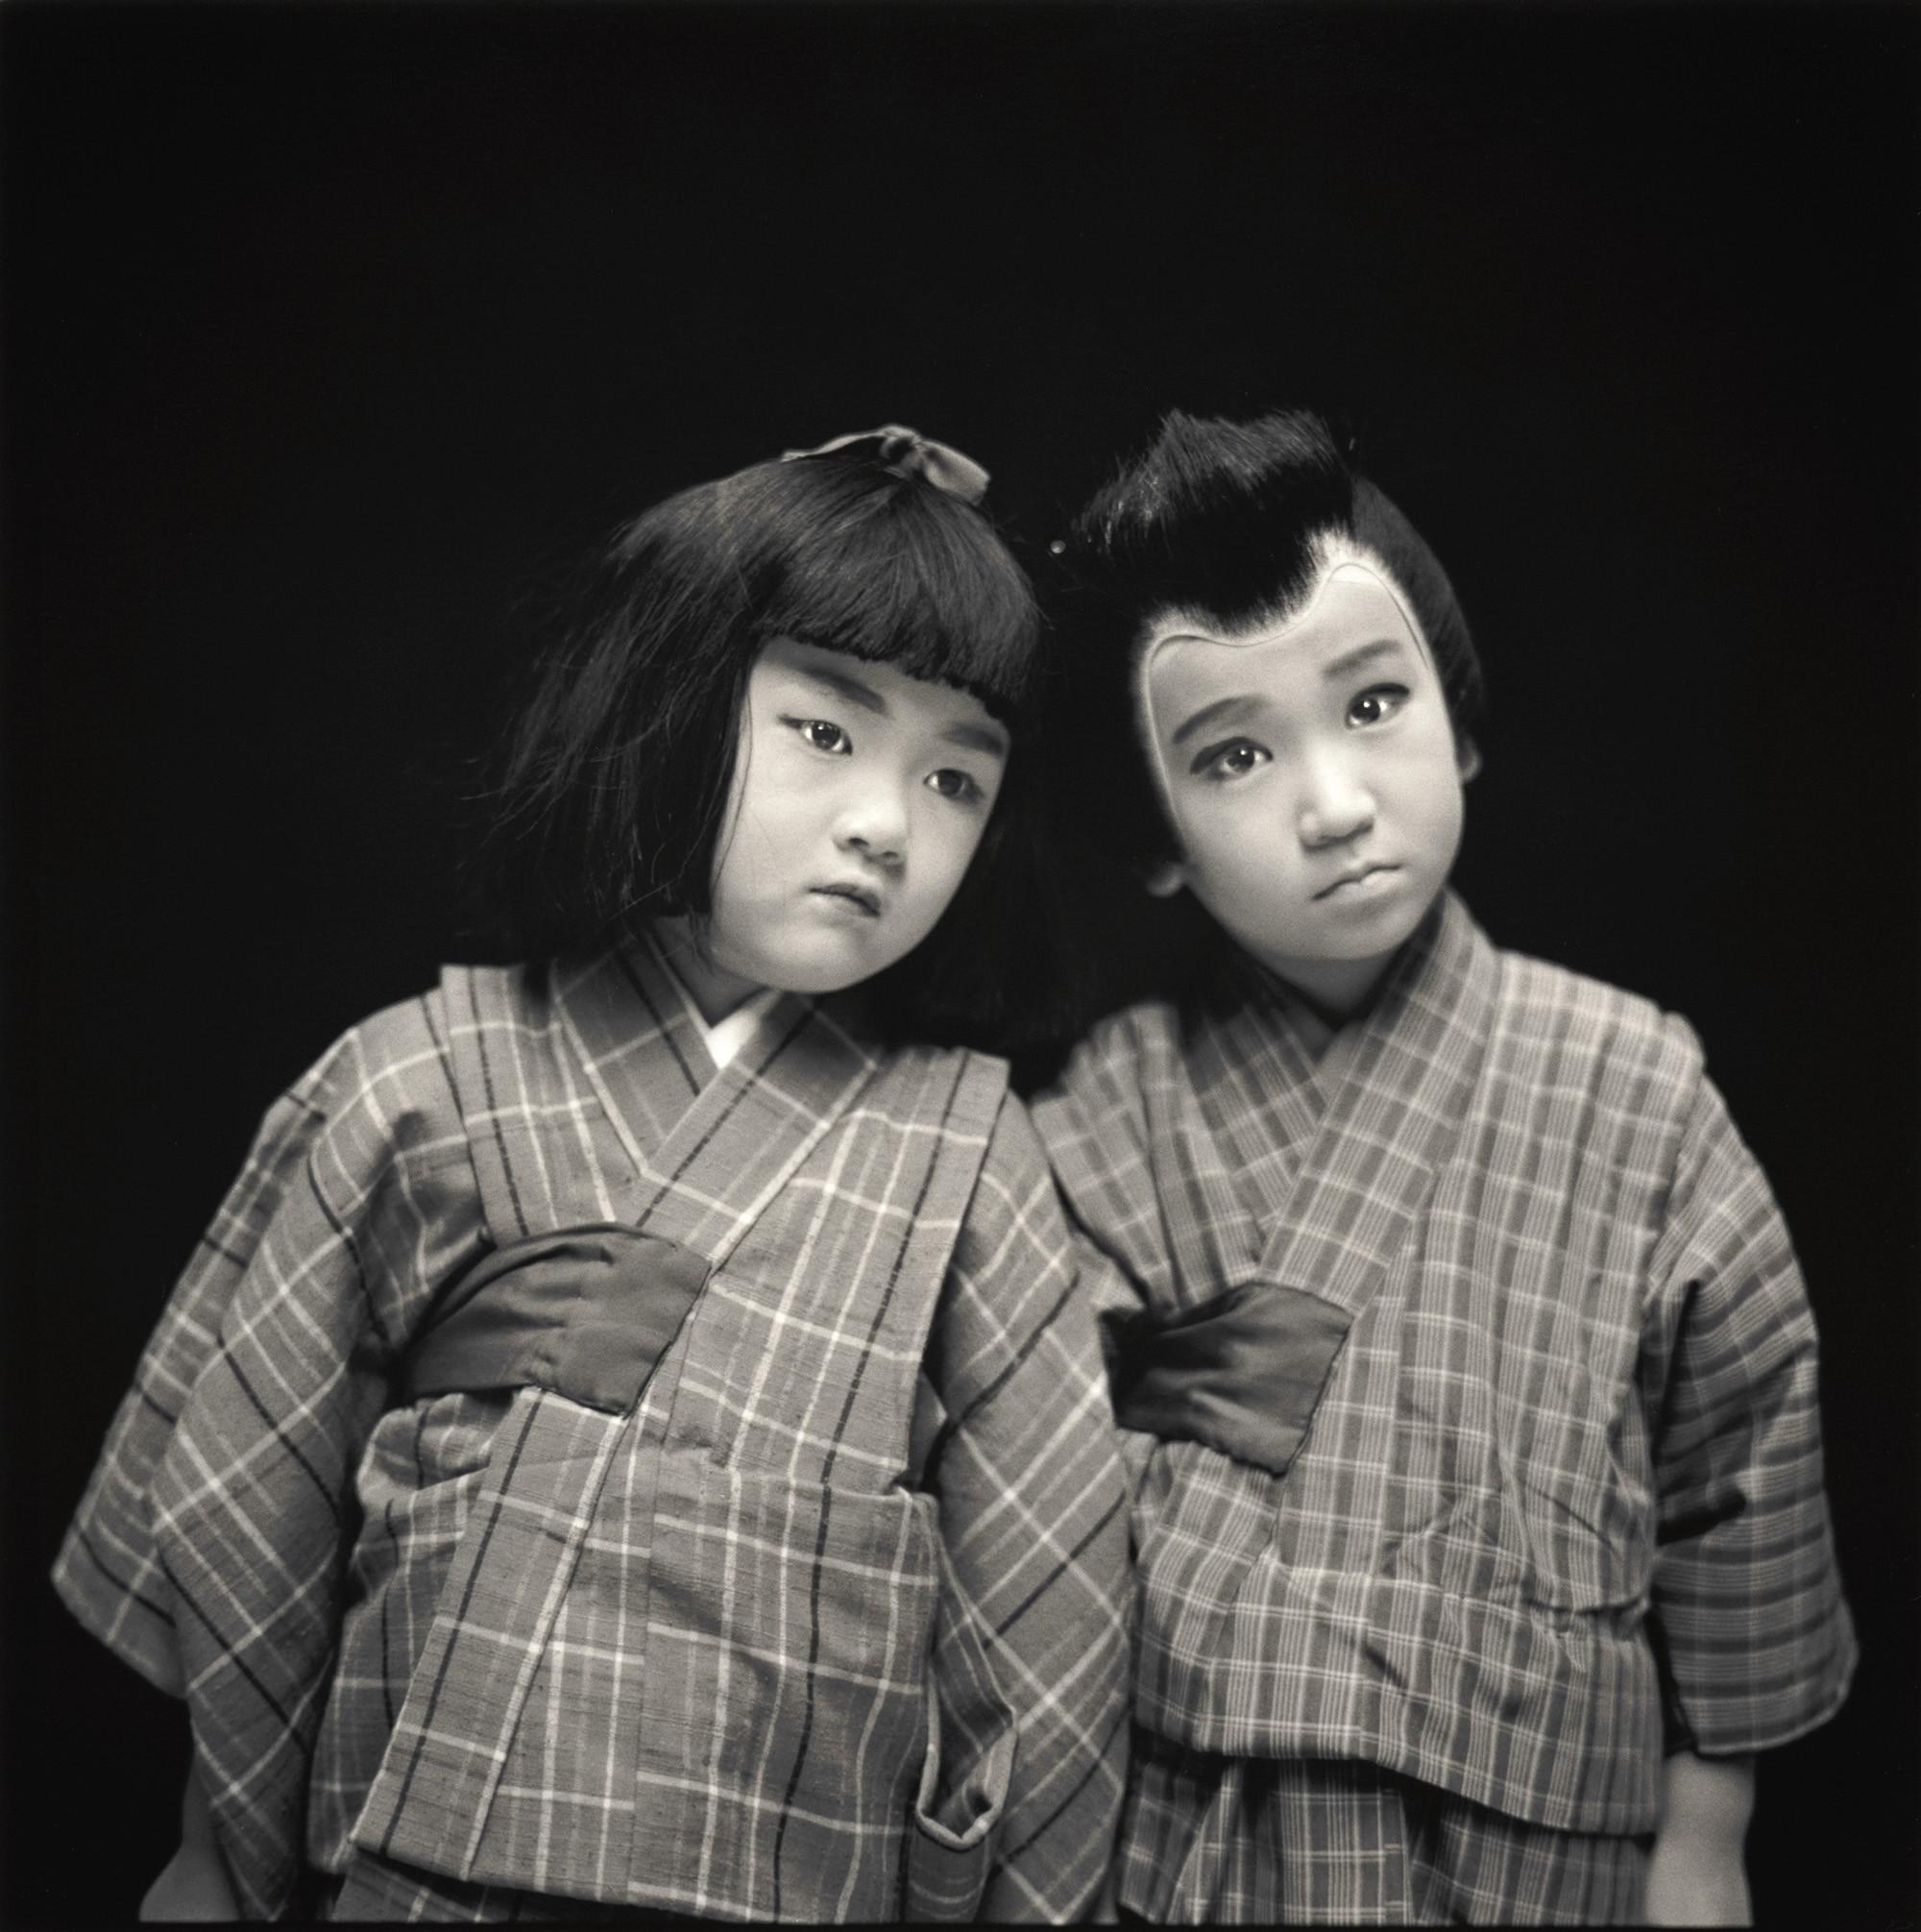 Актёры кабуки. Юка Онозаки и Икки Тада. Хироси Ватанабэ